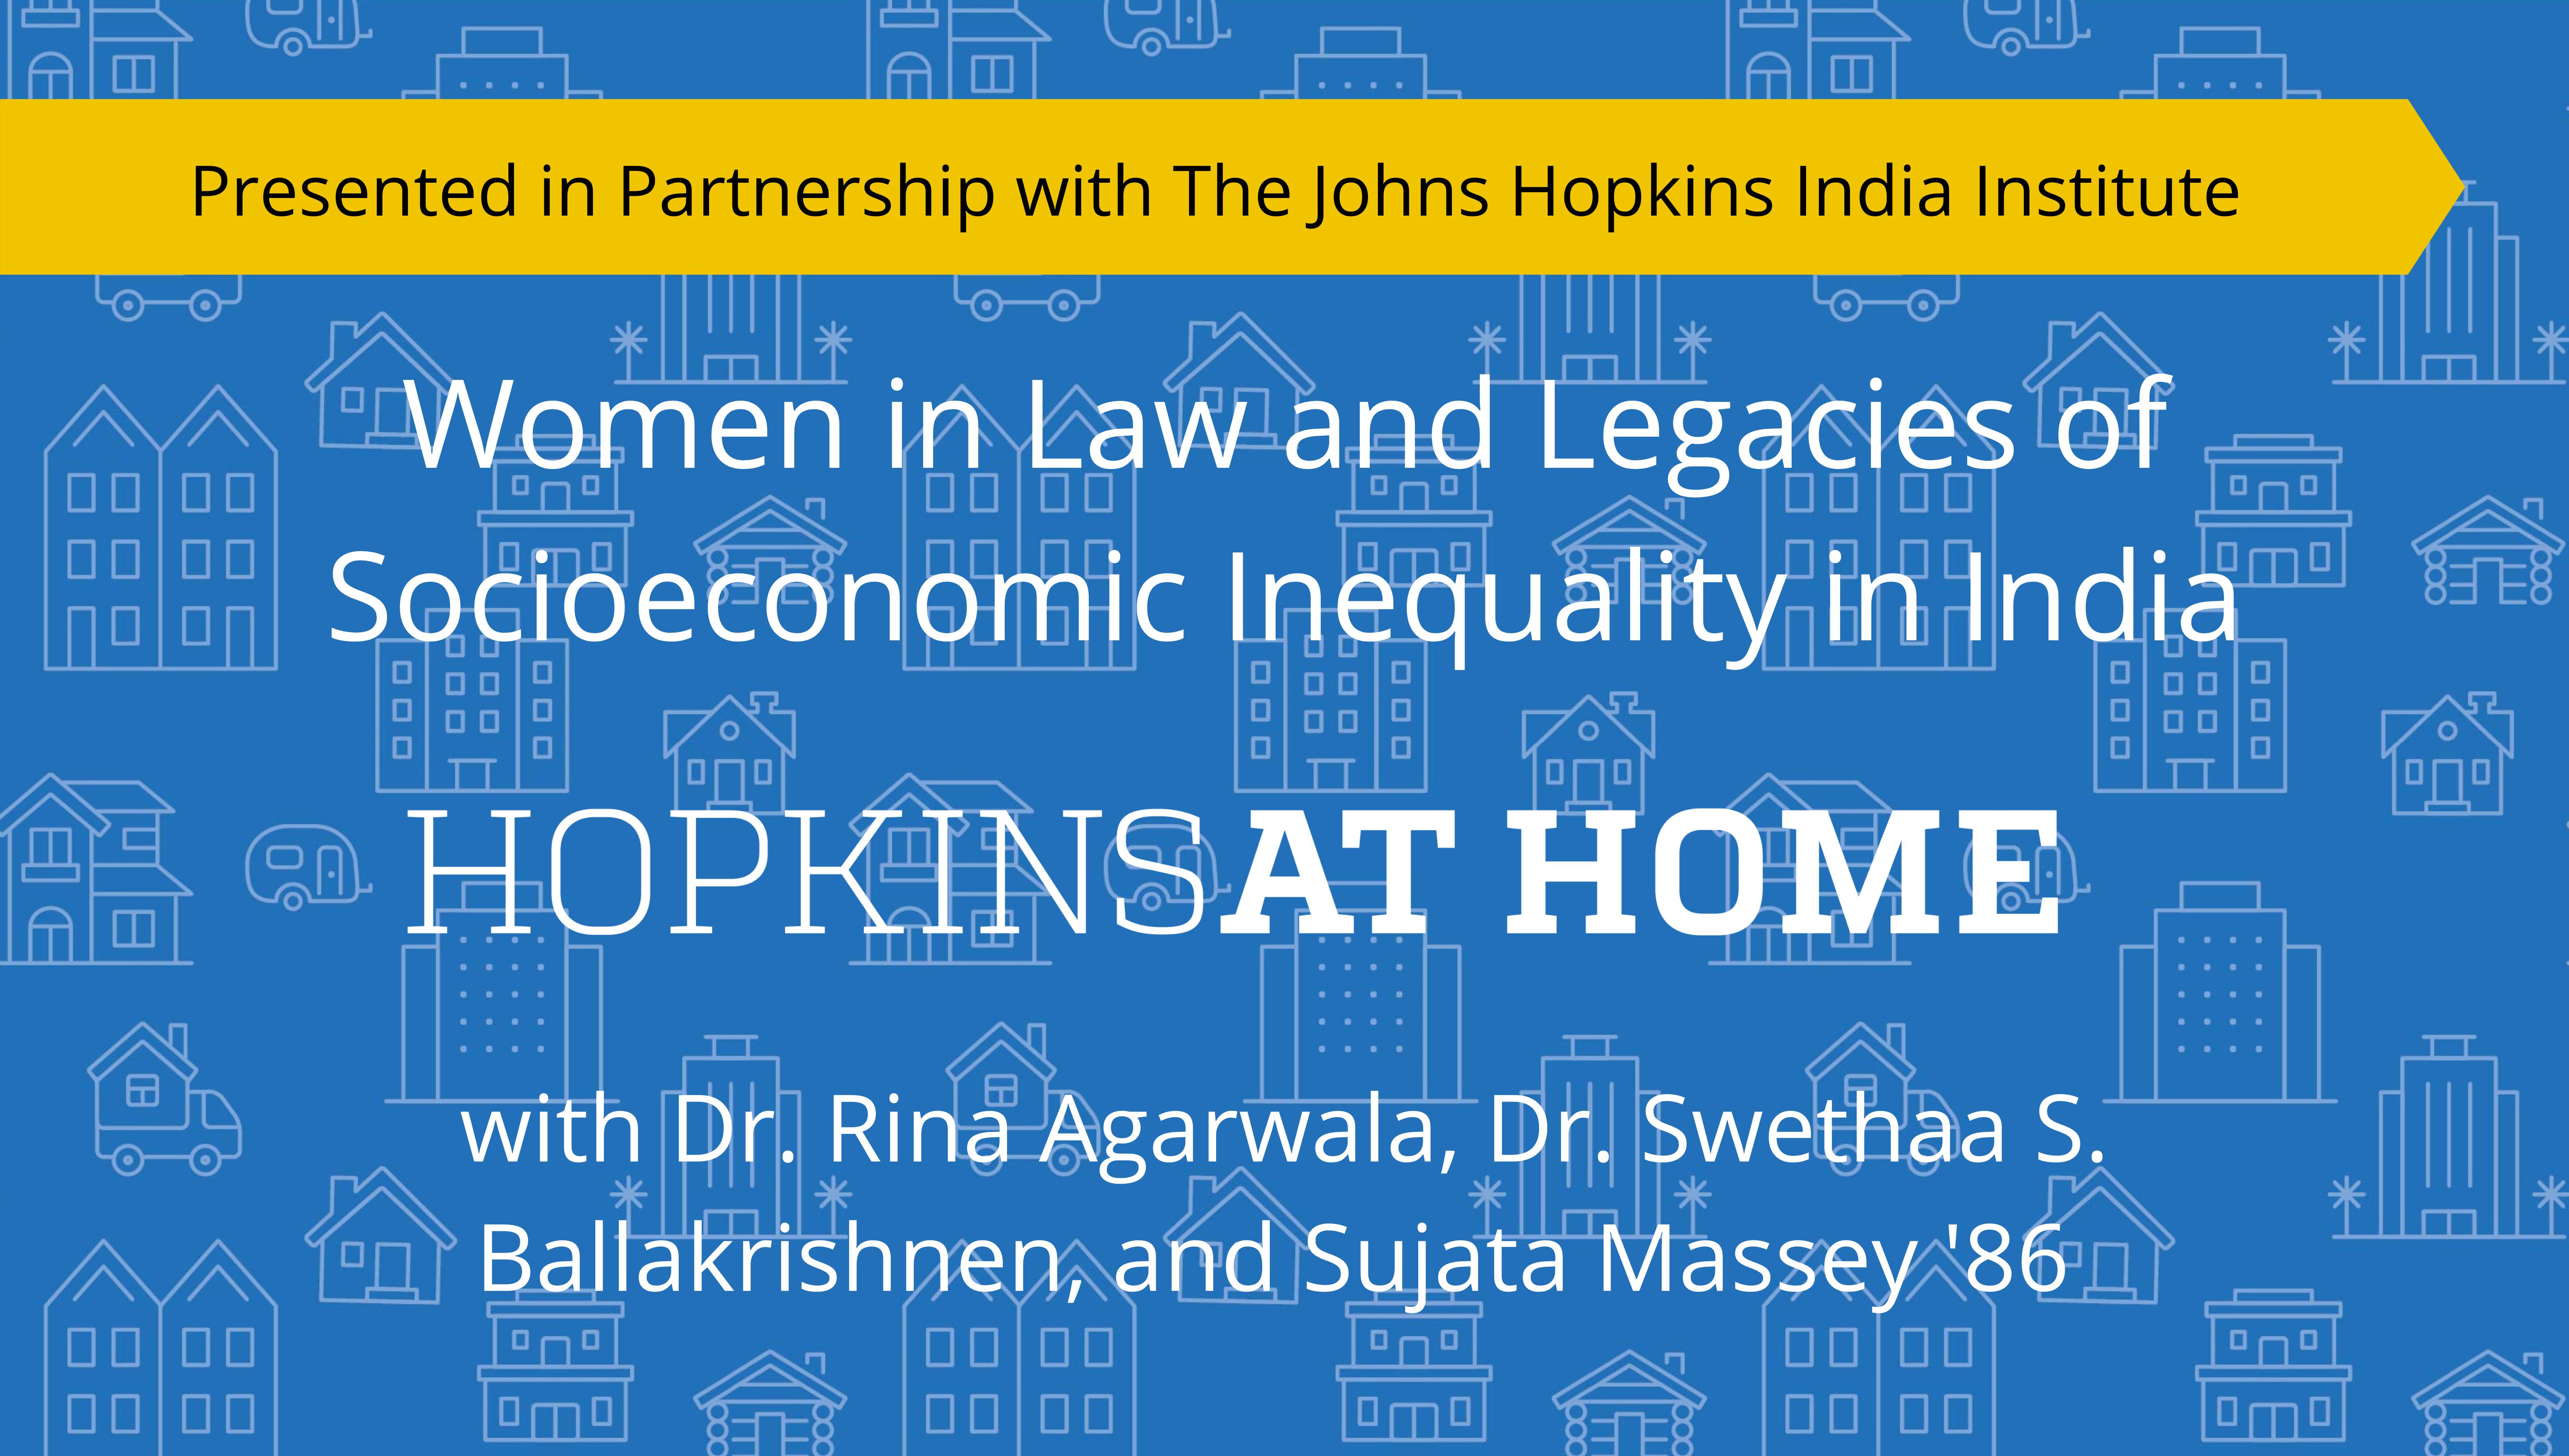 India Institute: Women in Law header image